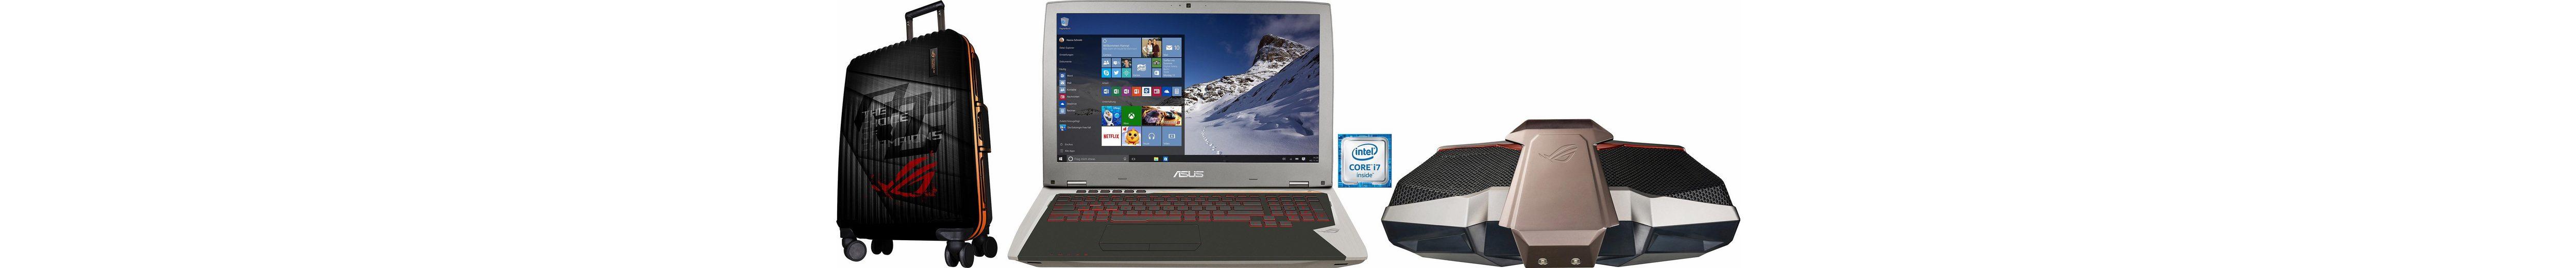 Asus GX700VO-GC009T Notebook, Intel® Core™ i7, 43,9 cm (17,3 Zoll), 512 GB Speicher